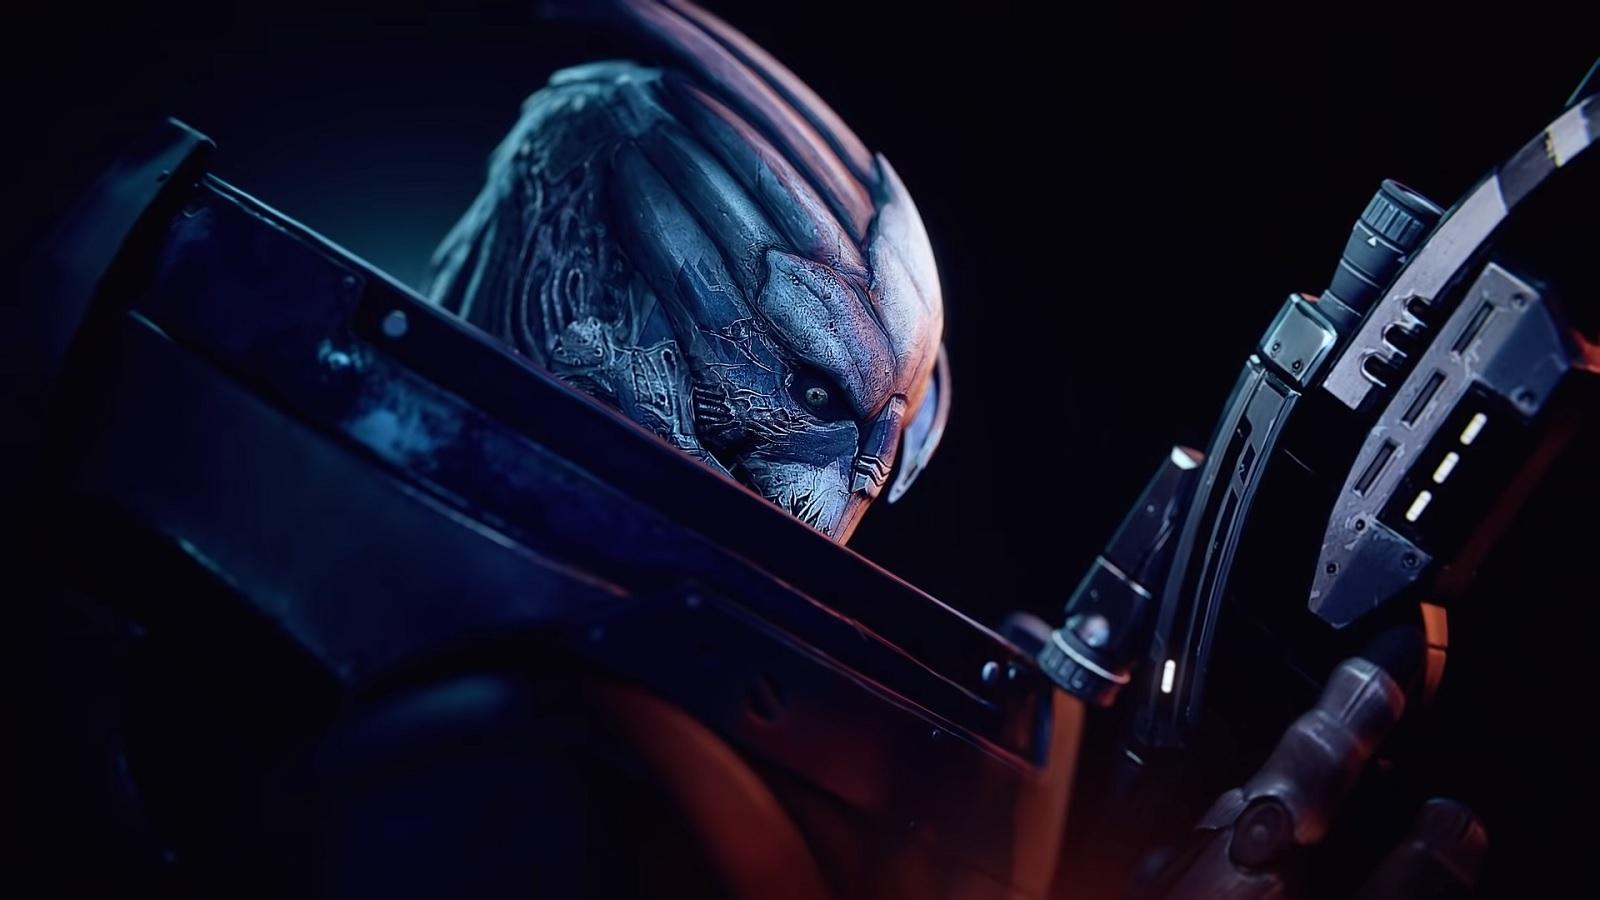 Калибровка завершена: сборник Mass Effect Legendary Edition ушёл на золото